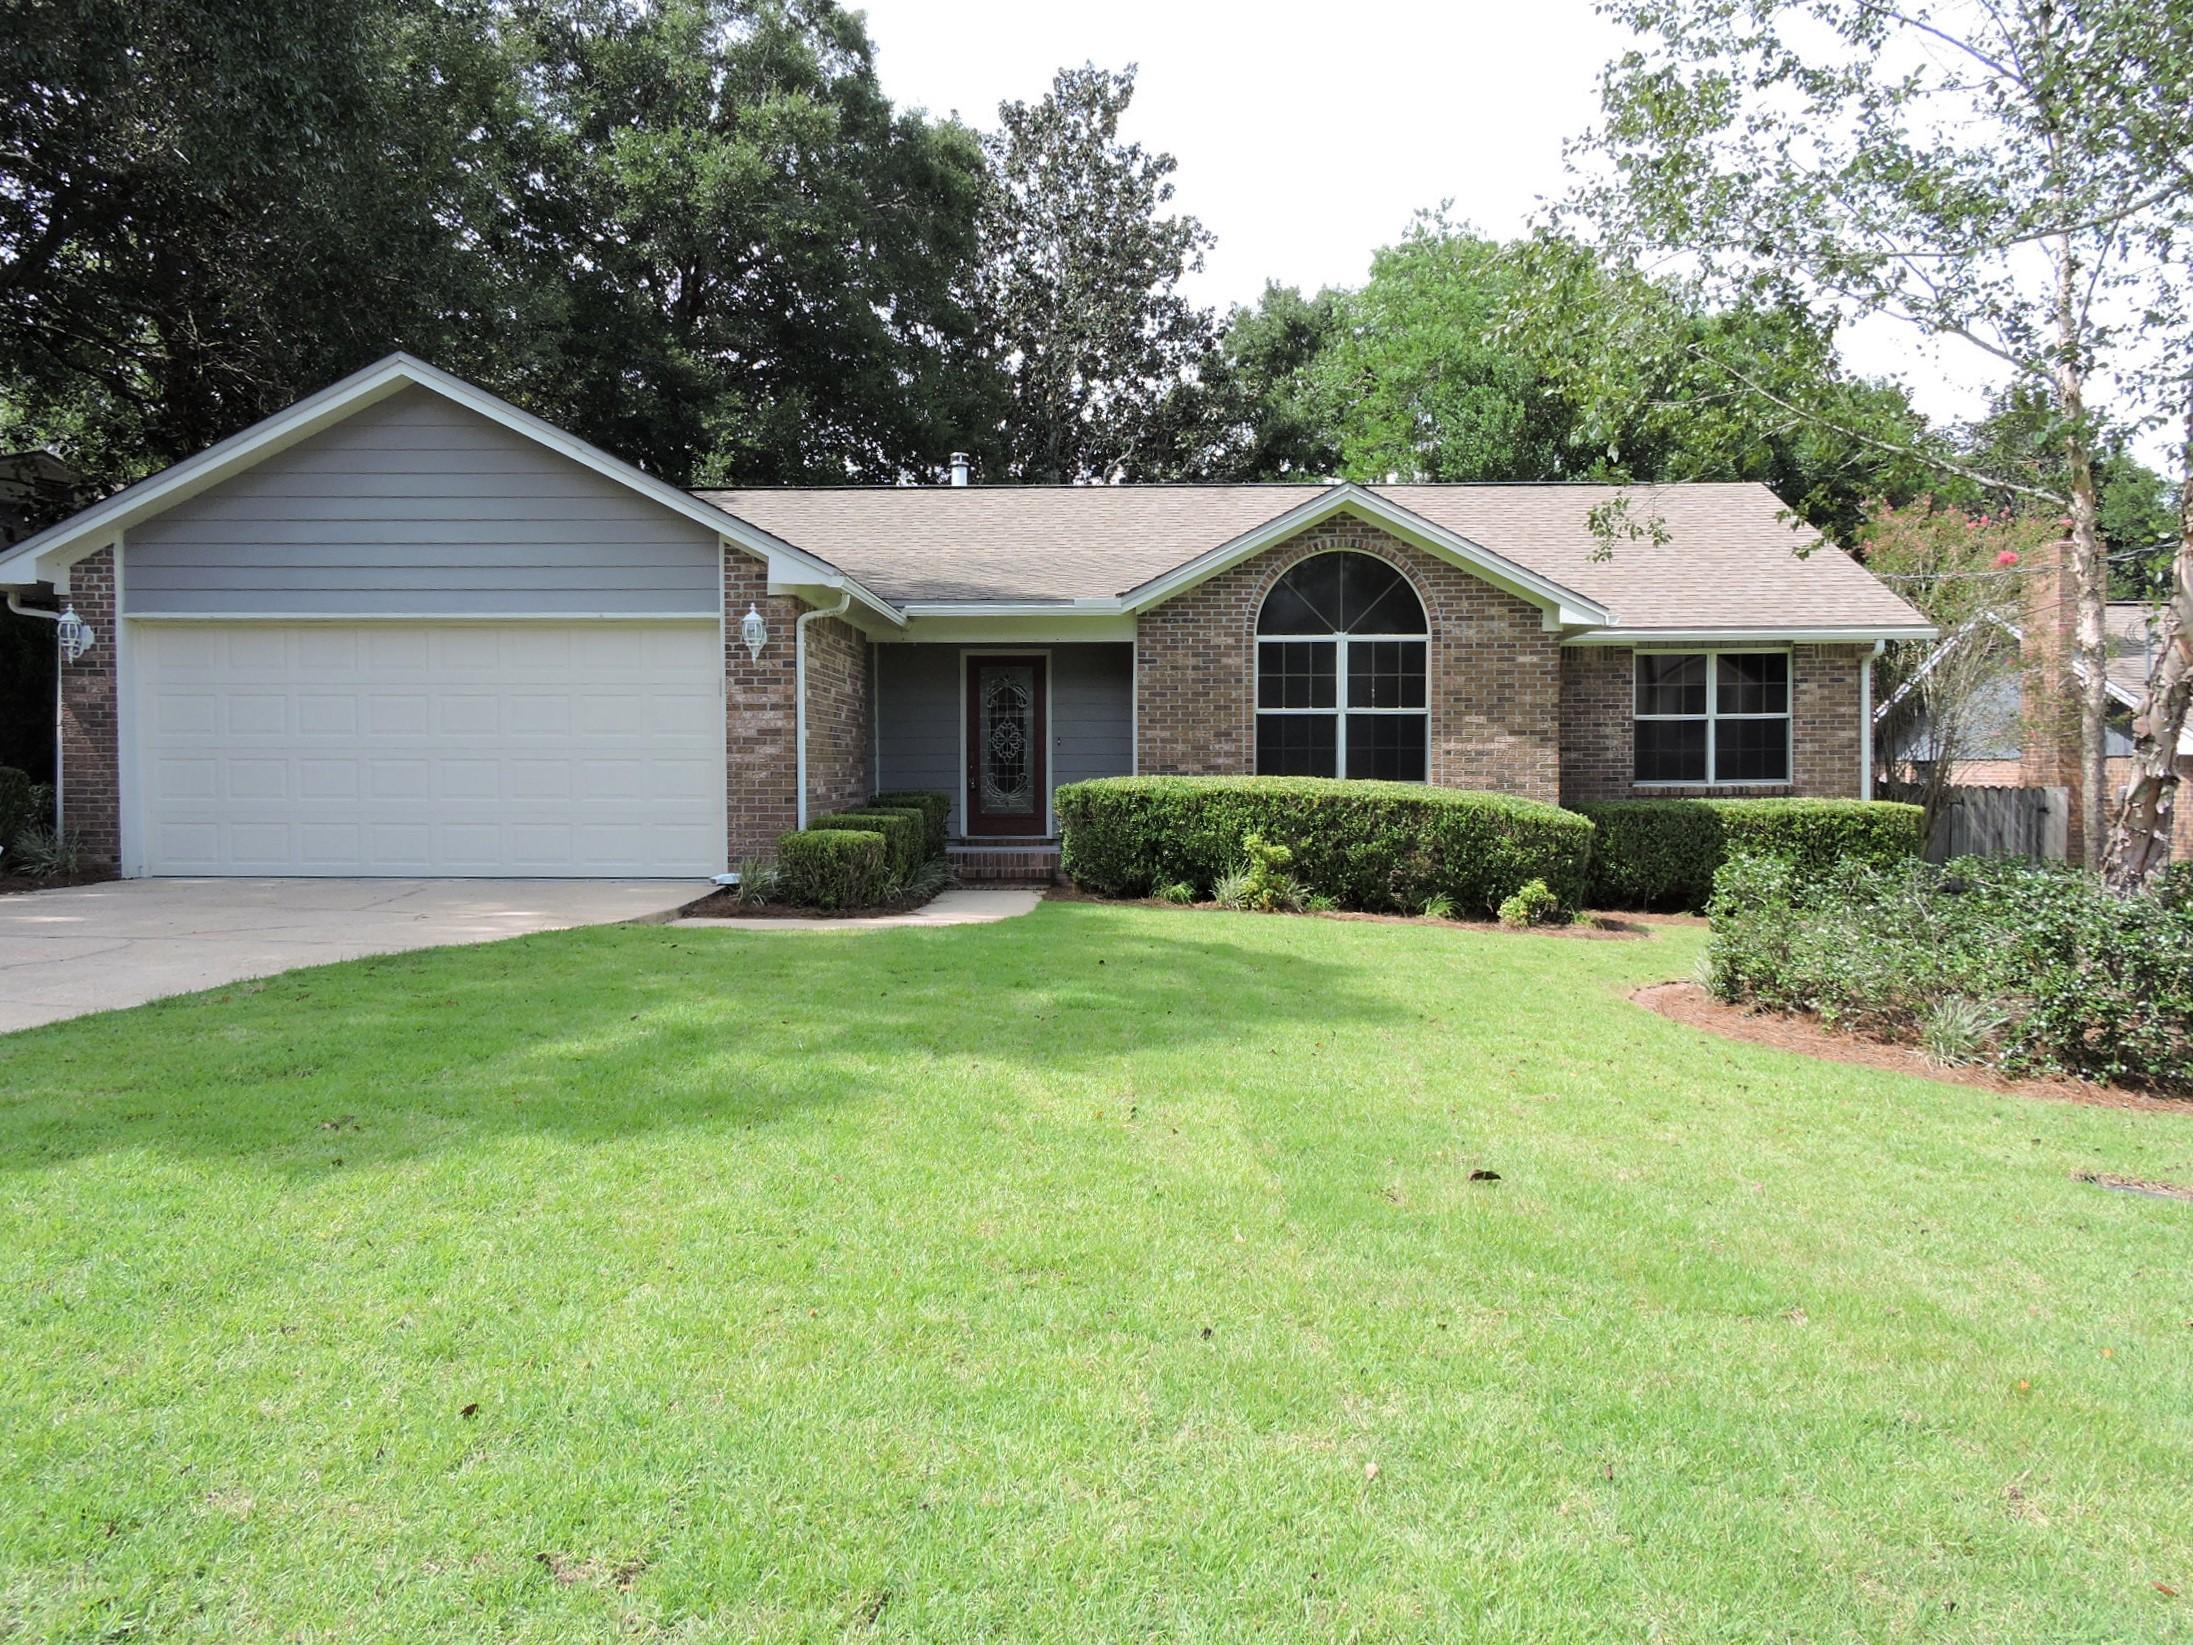 Photo of home for sale at 1230 Rhonda, Niceville FL